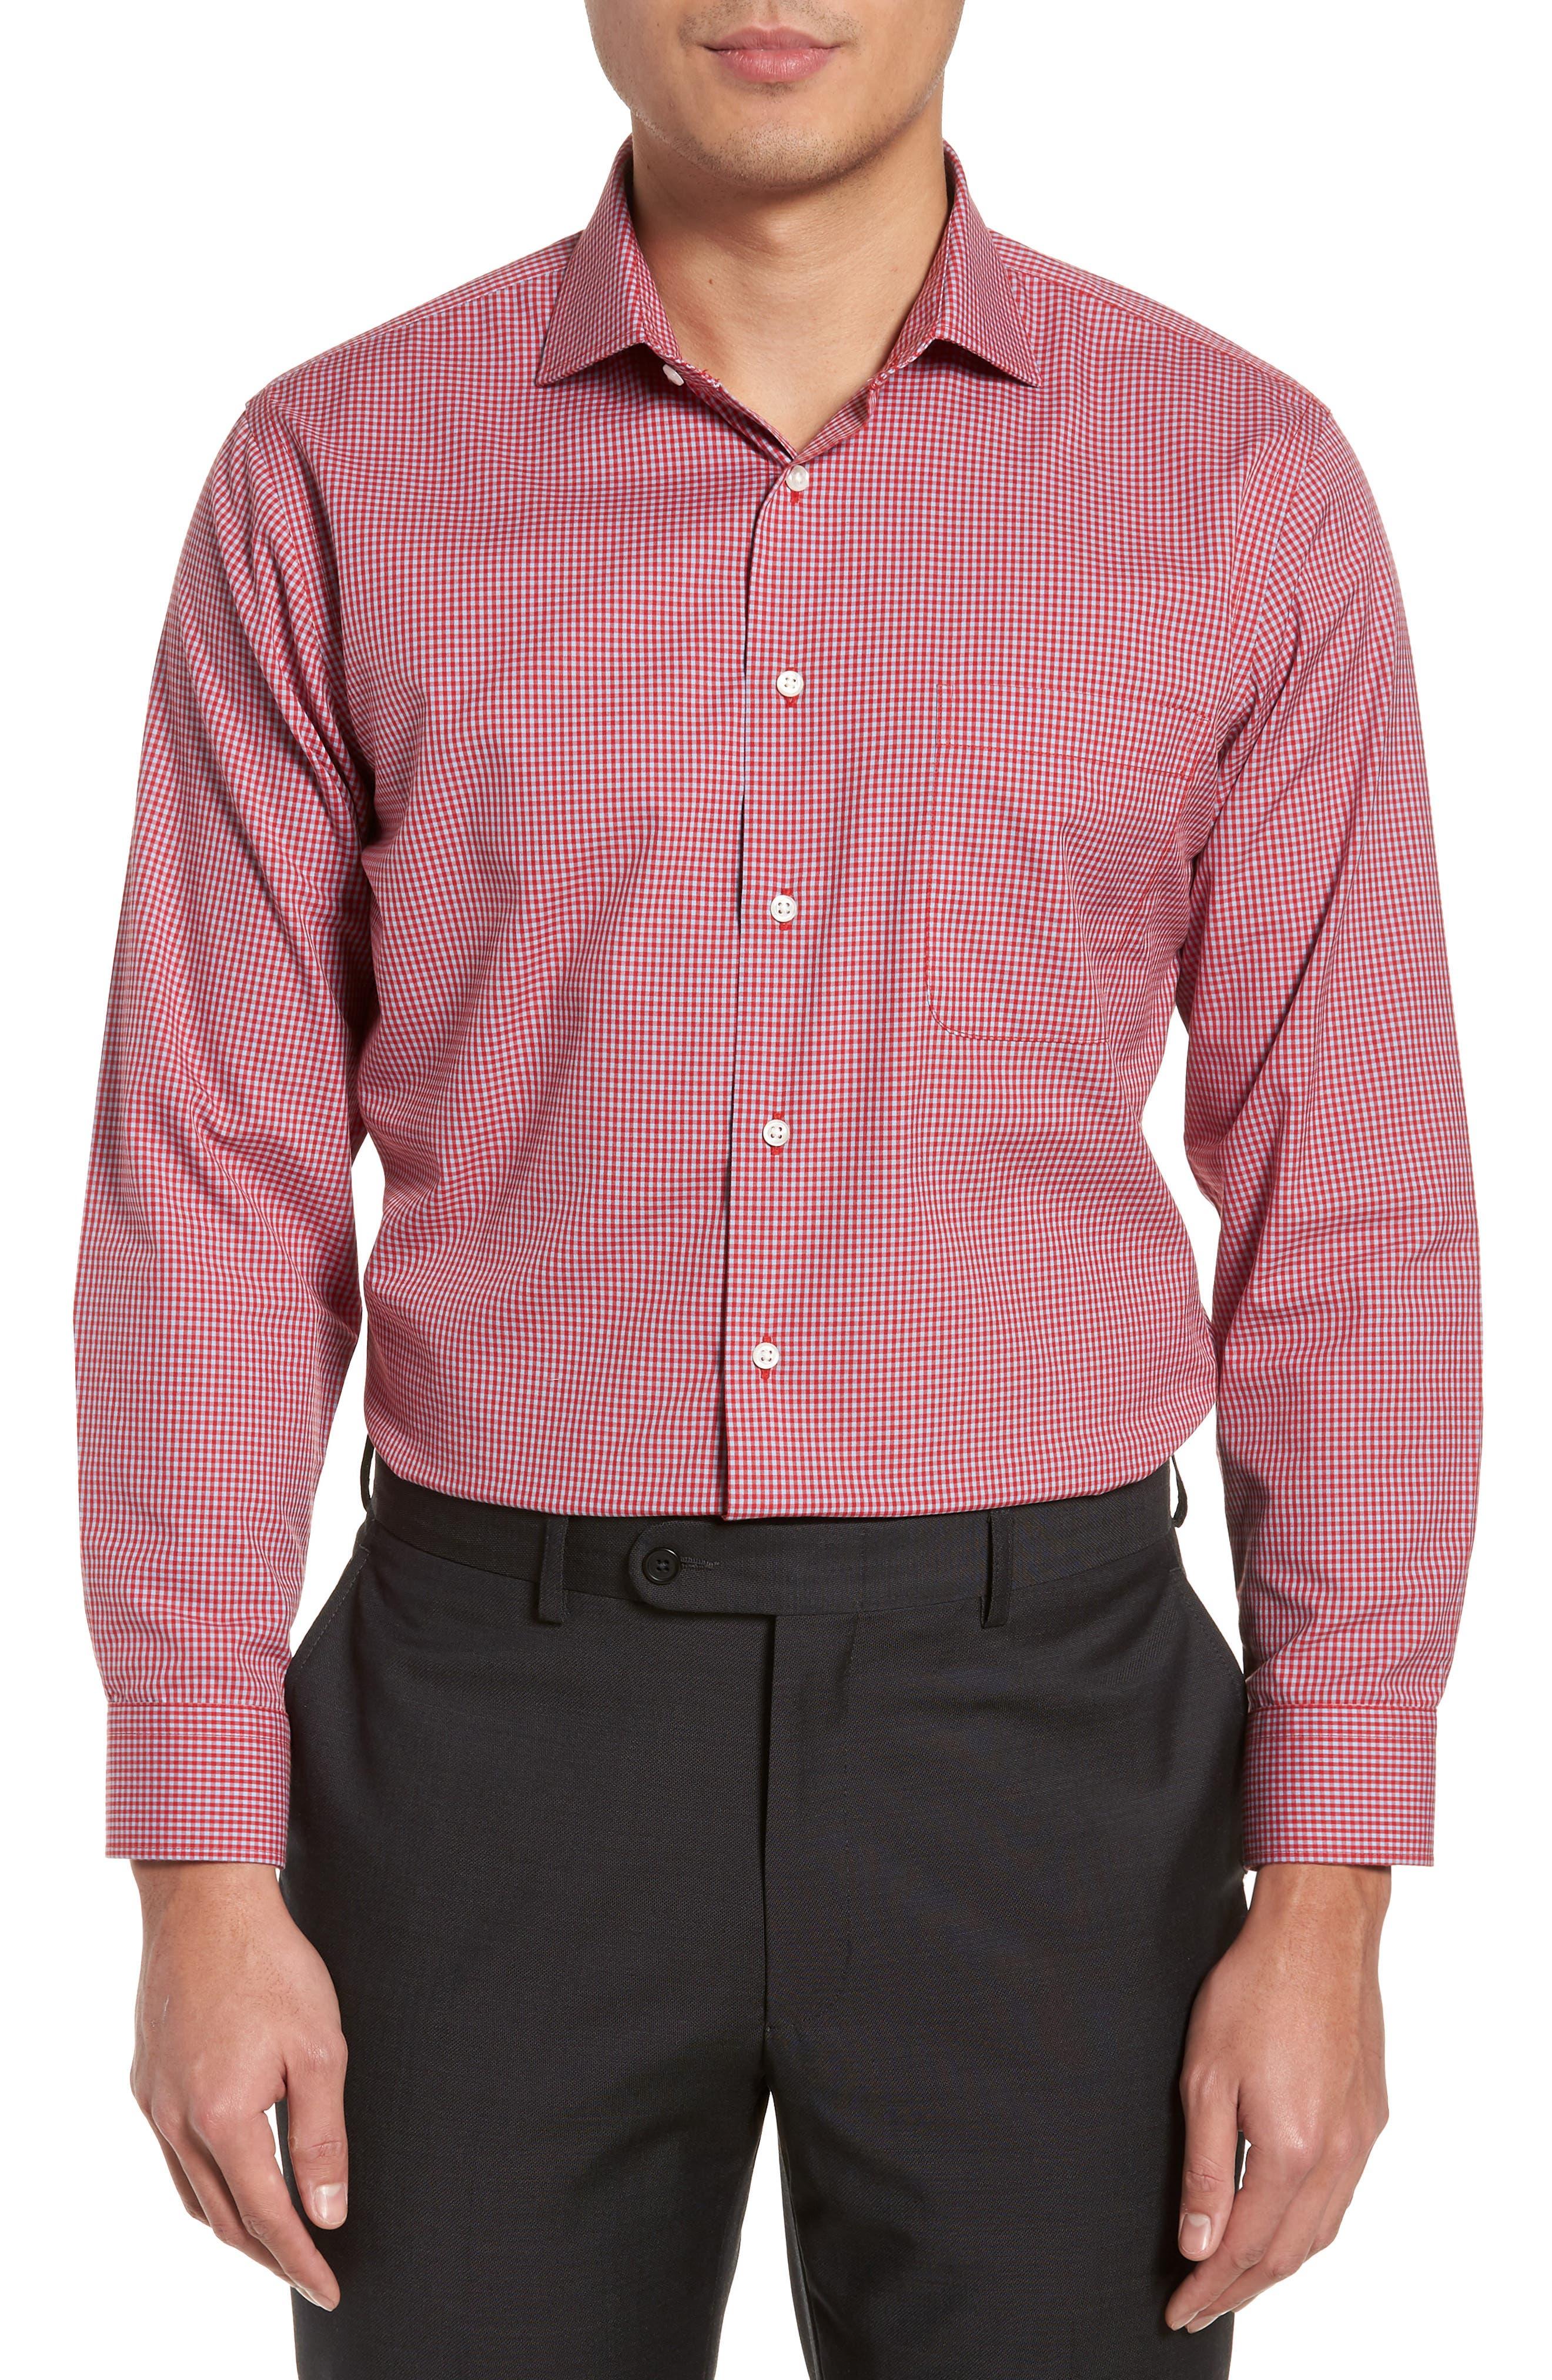 Smartcare<sup>™</sup> Trim Fit Check Dress Shirt,                             Main thumbnail 1, color,                             Red Barbados